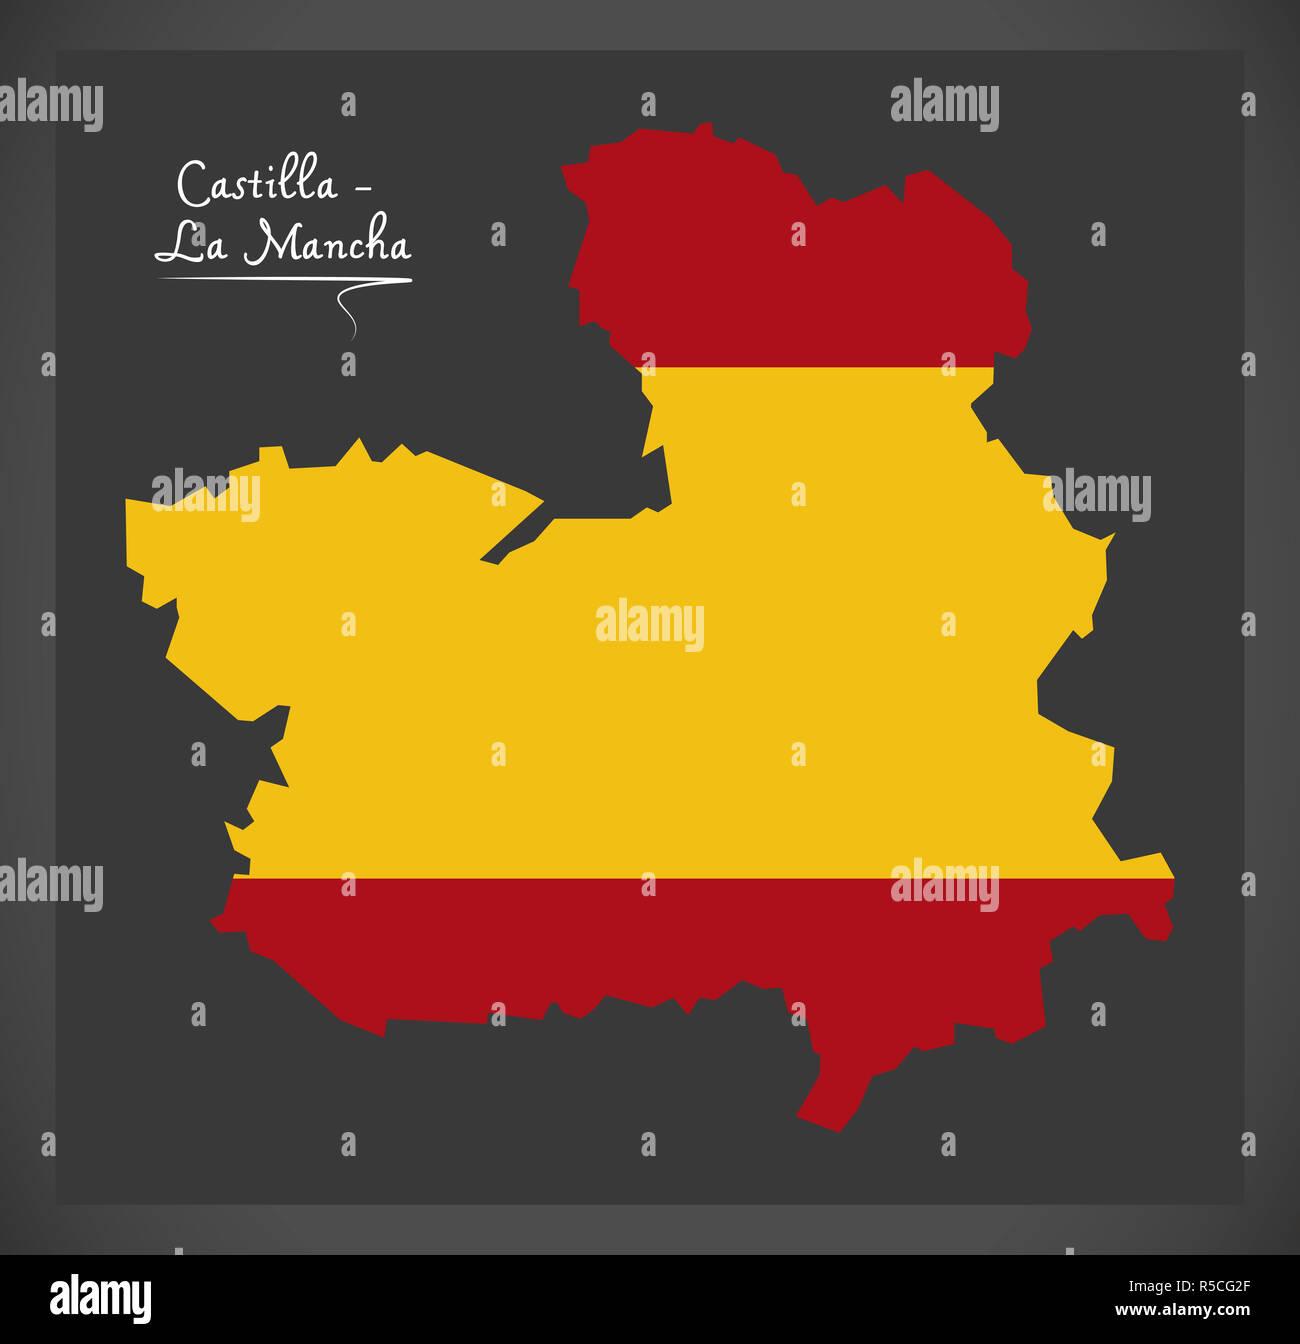 Map Of Spain La Mancha.Castilla La Mancha Map With Spanish National Flag Illustration